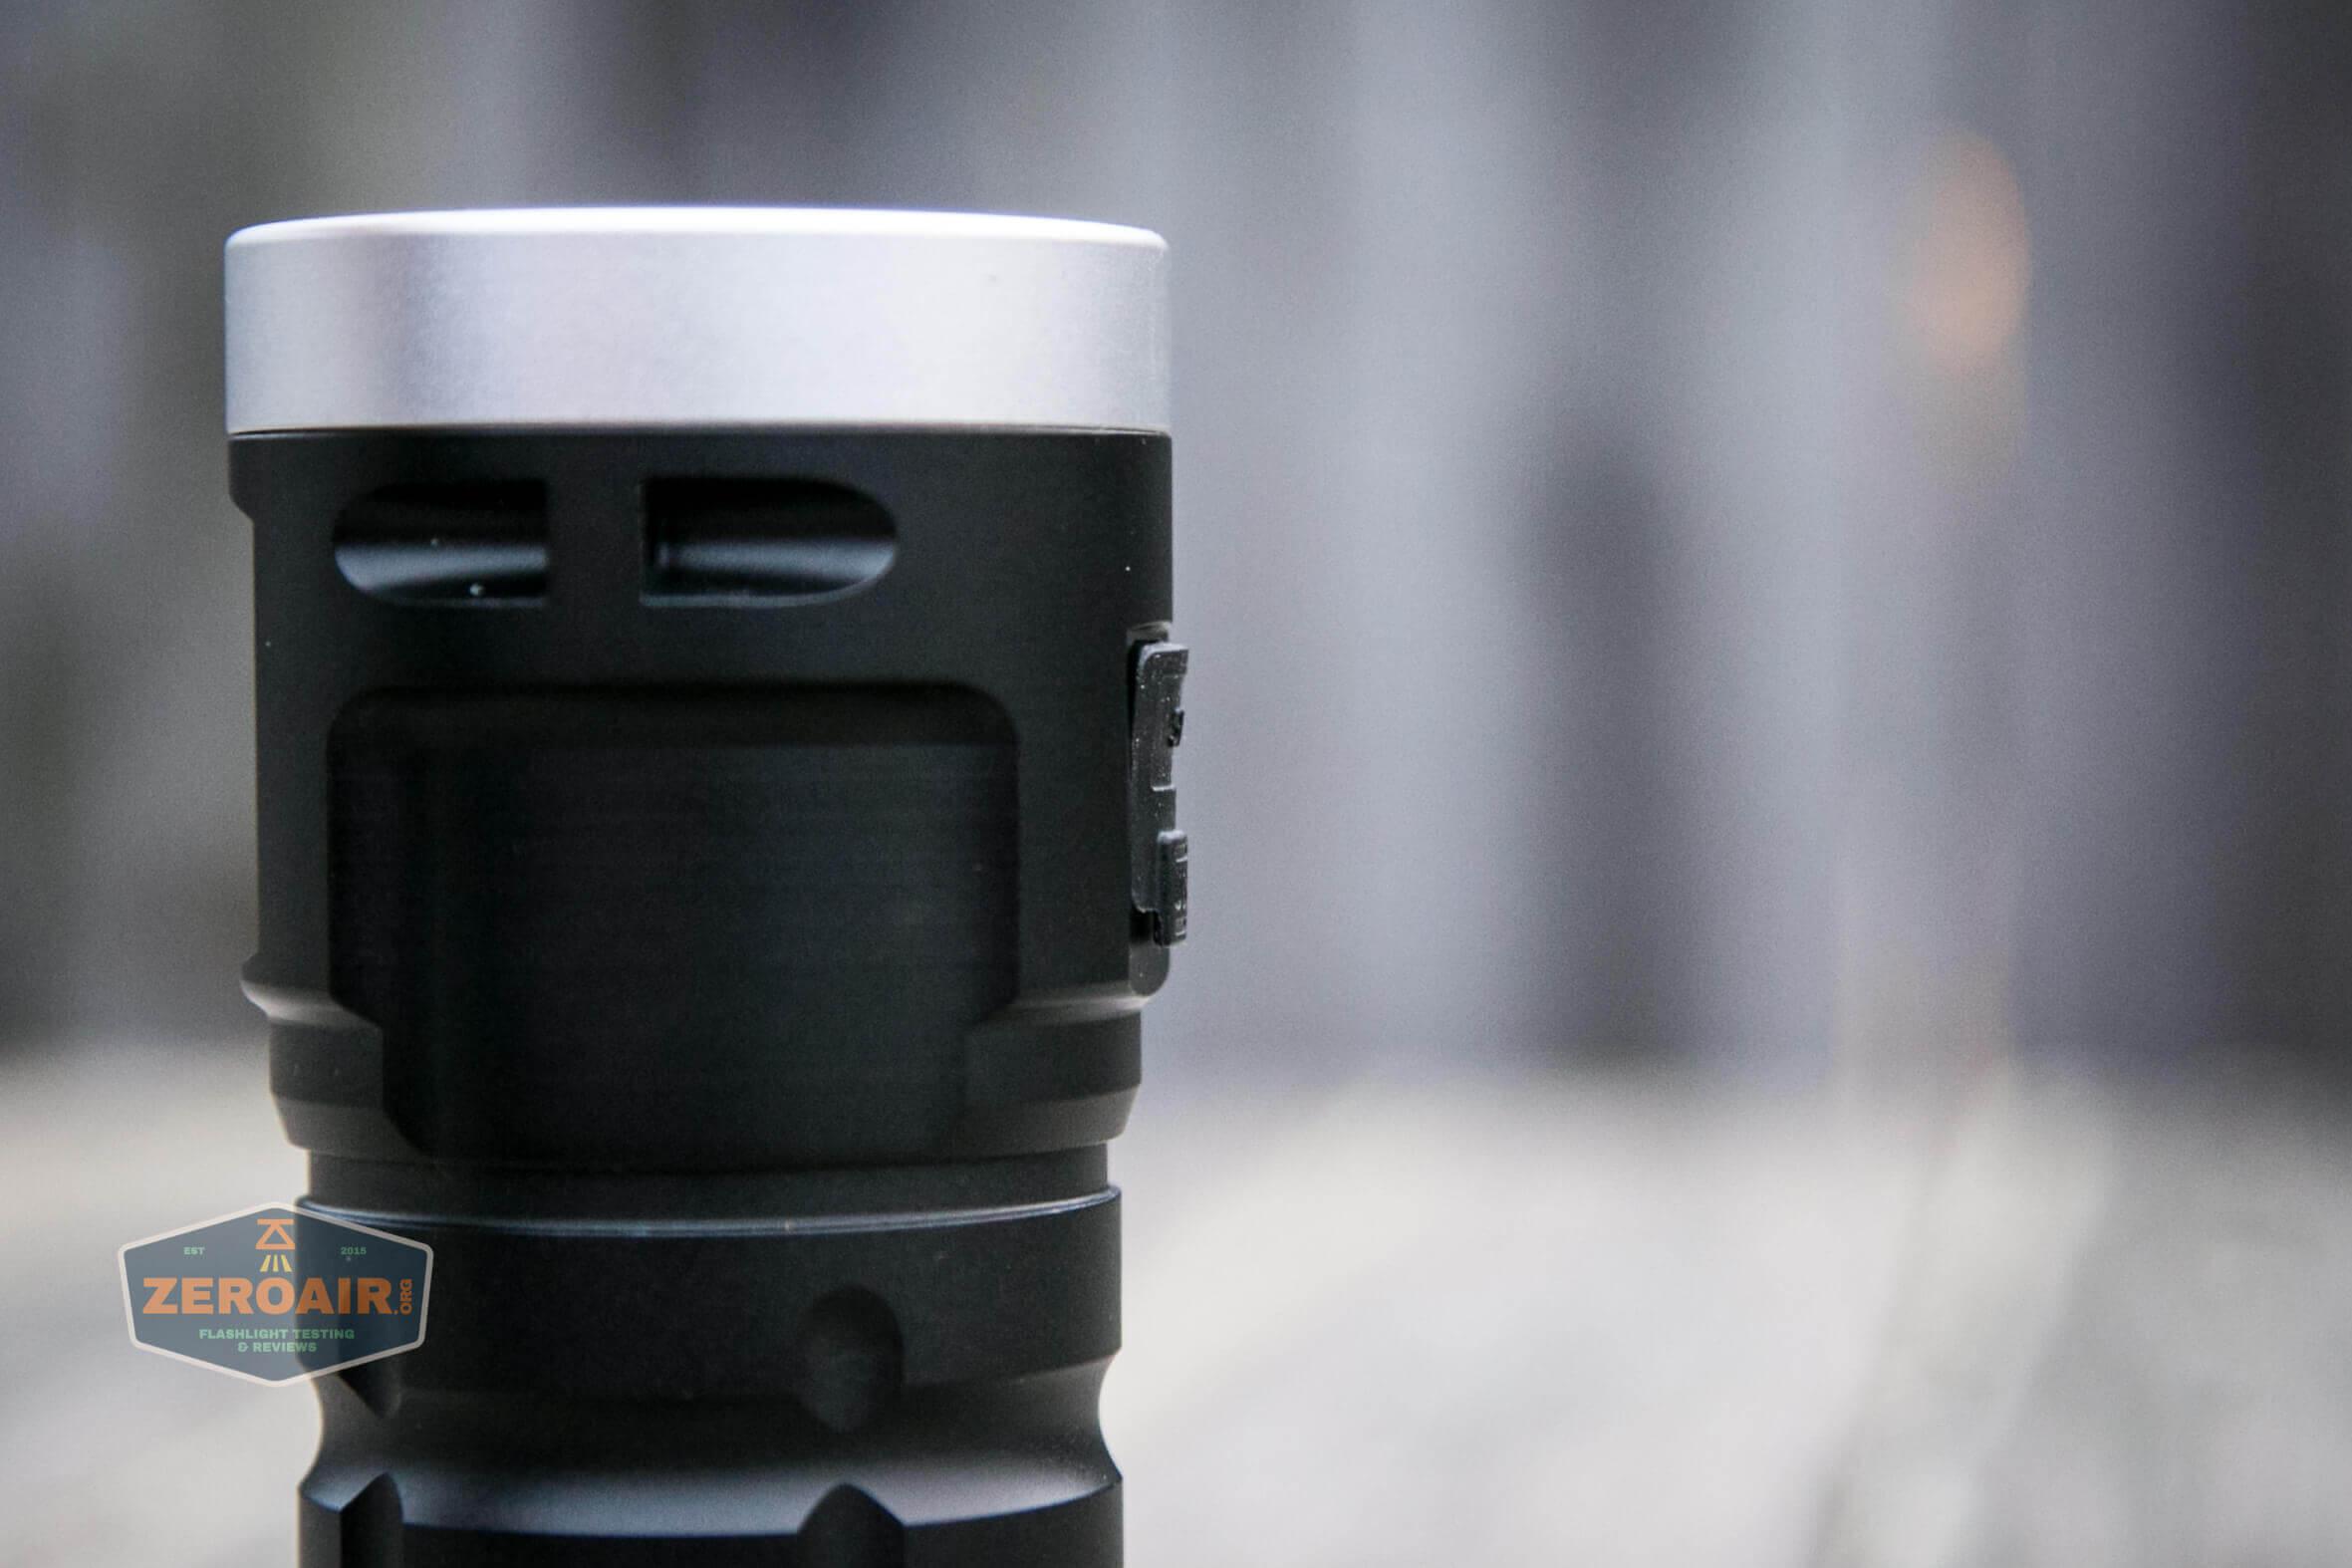 nitebeam x12uv flashlight charge port profile